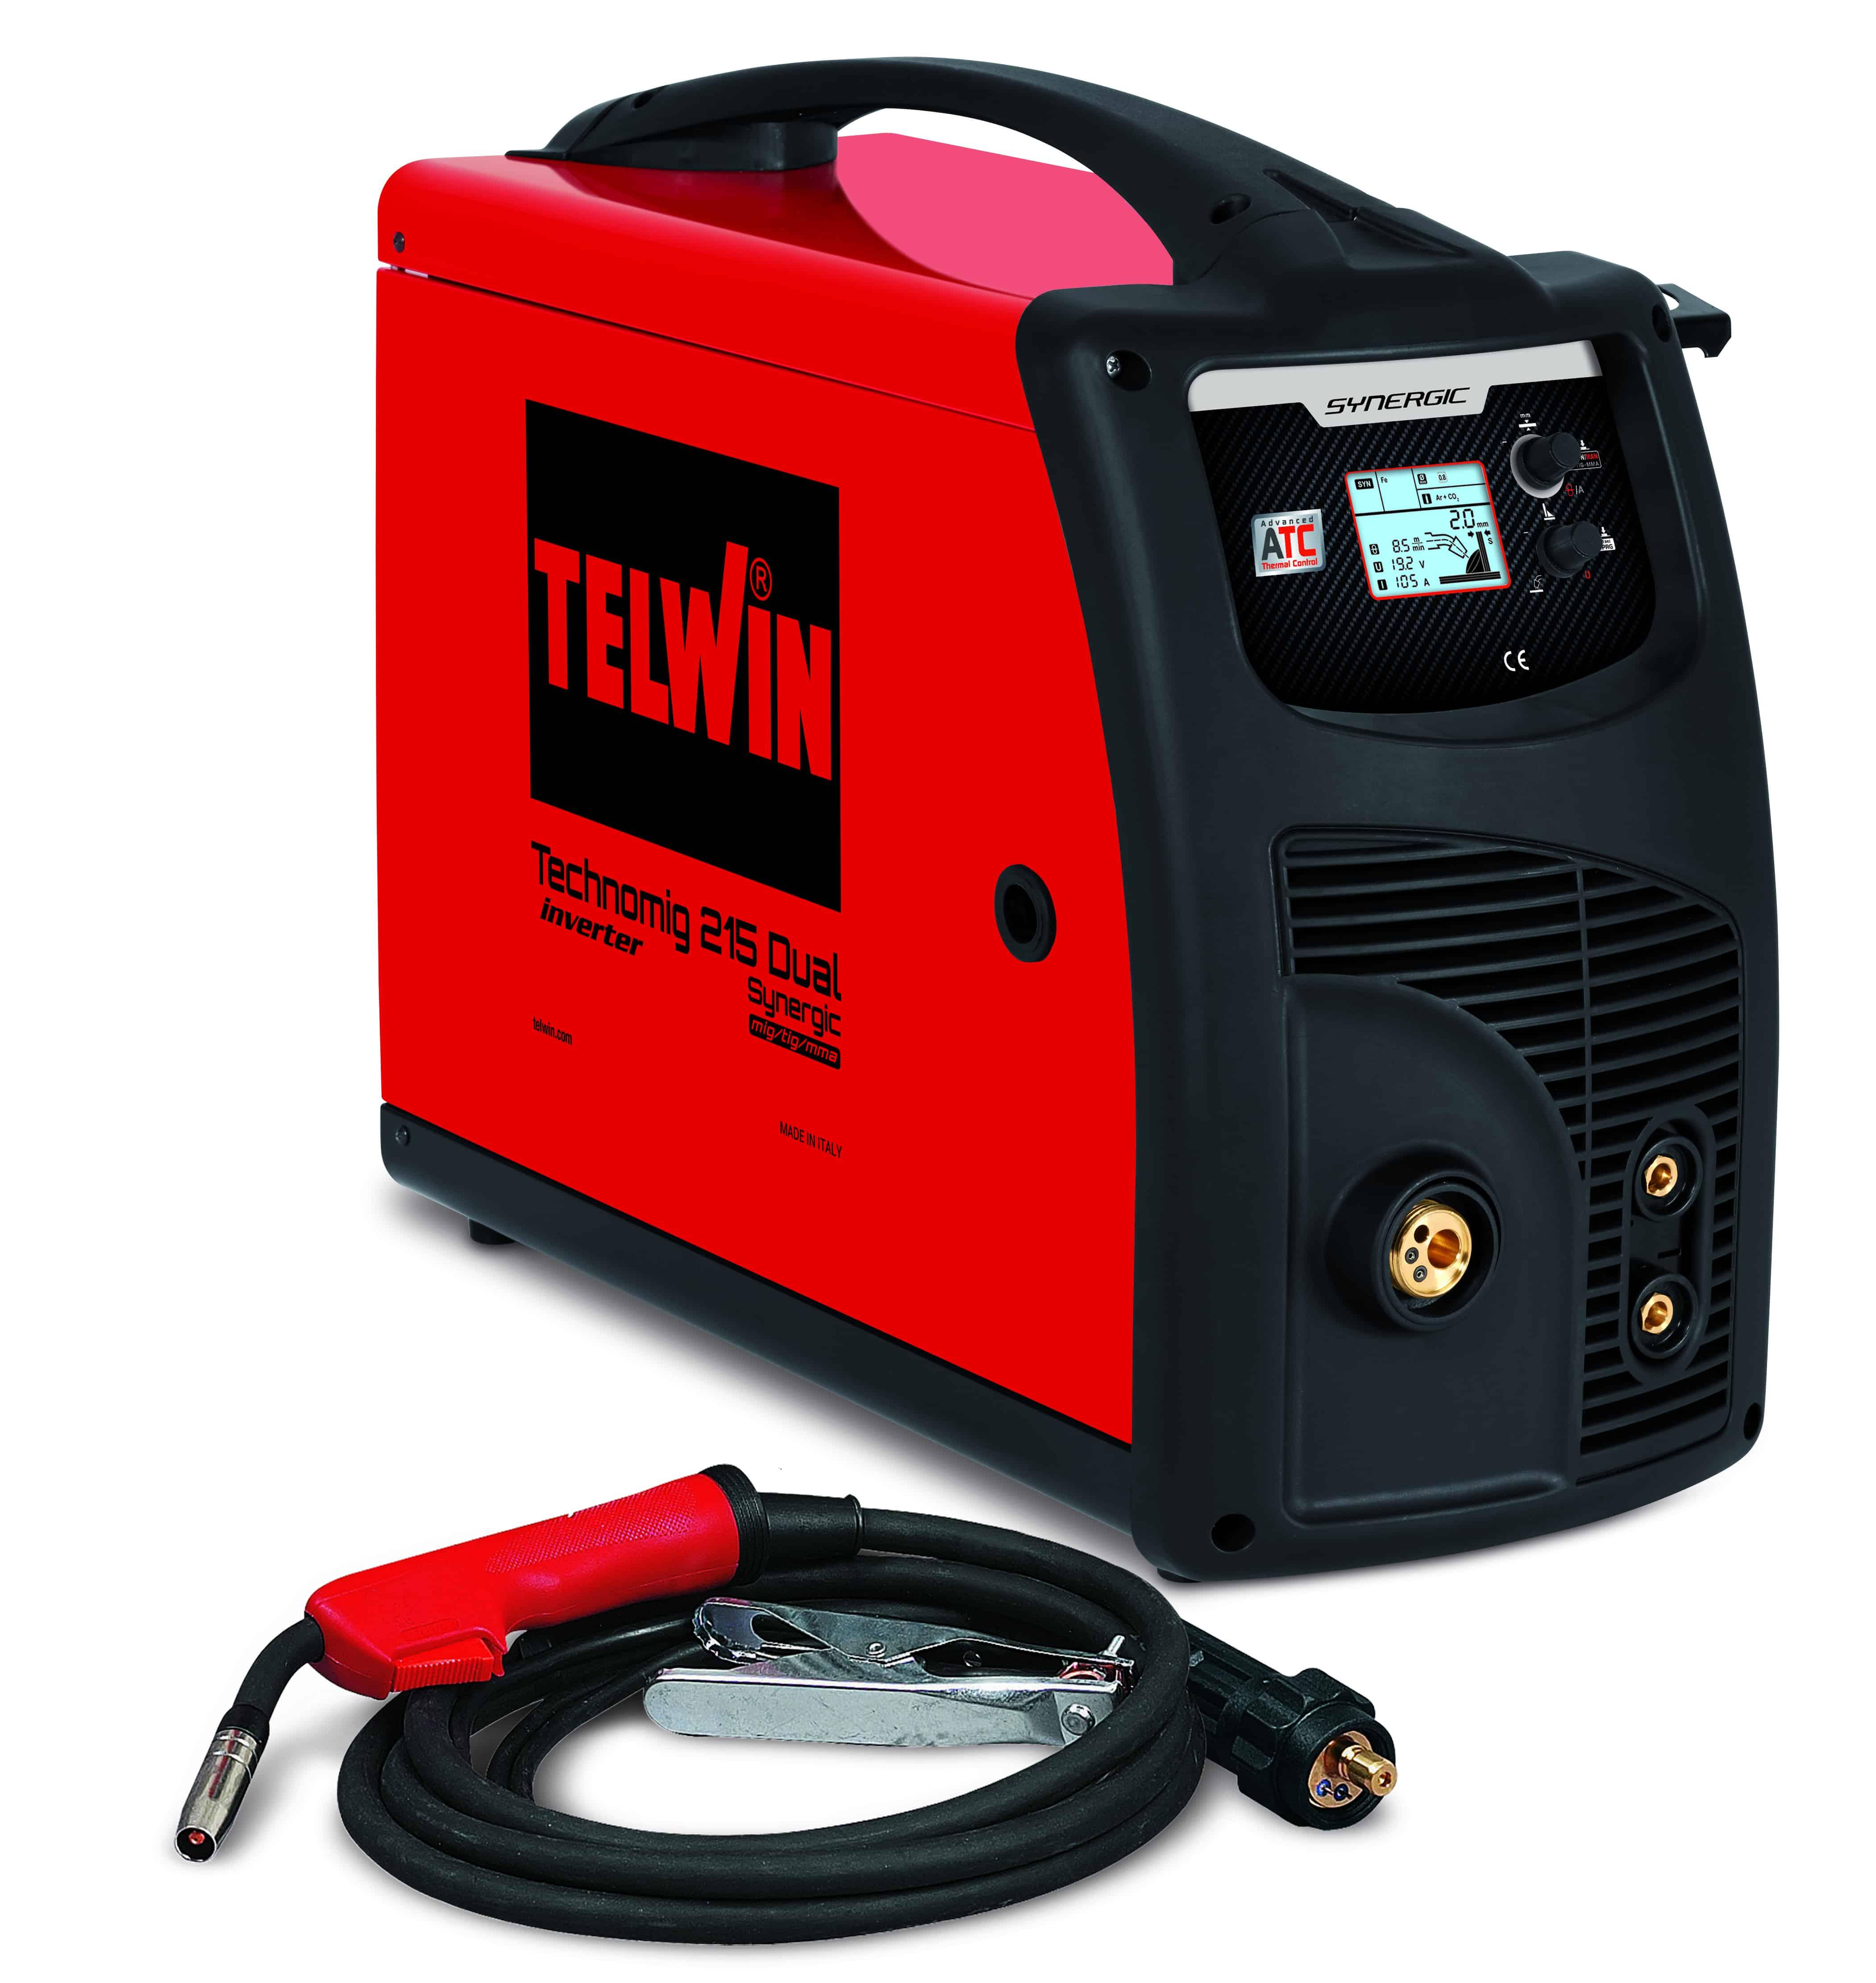 TELWIN 816053 - TECHNOMIG 215 DUAL SYNERGIC 230V, MIG-MAG welding machine, P-Max(5kW)